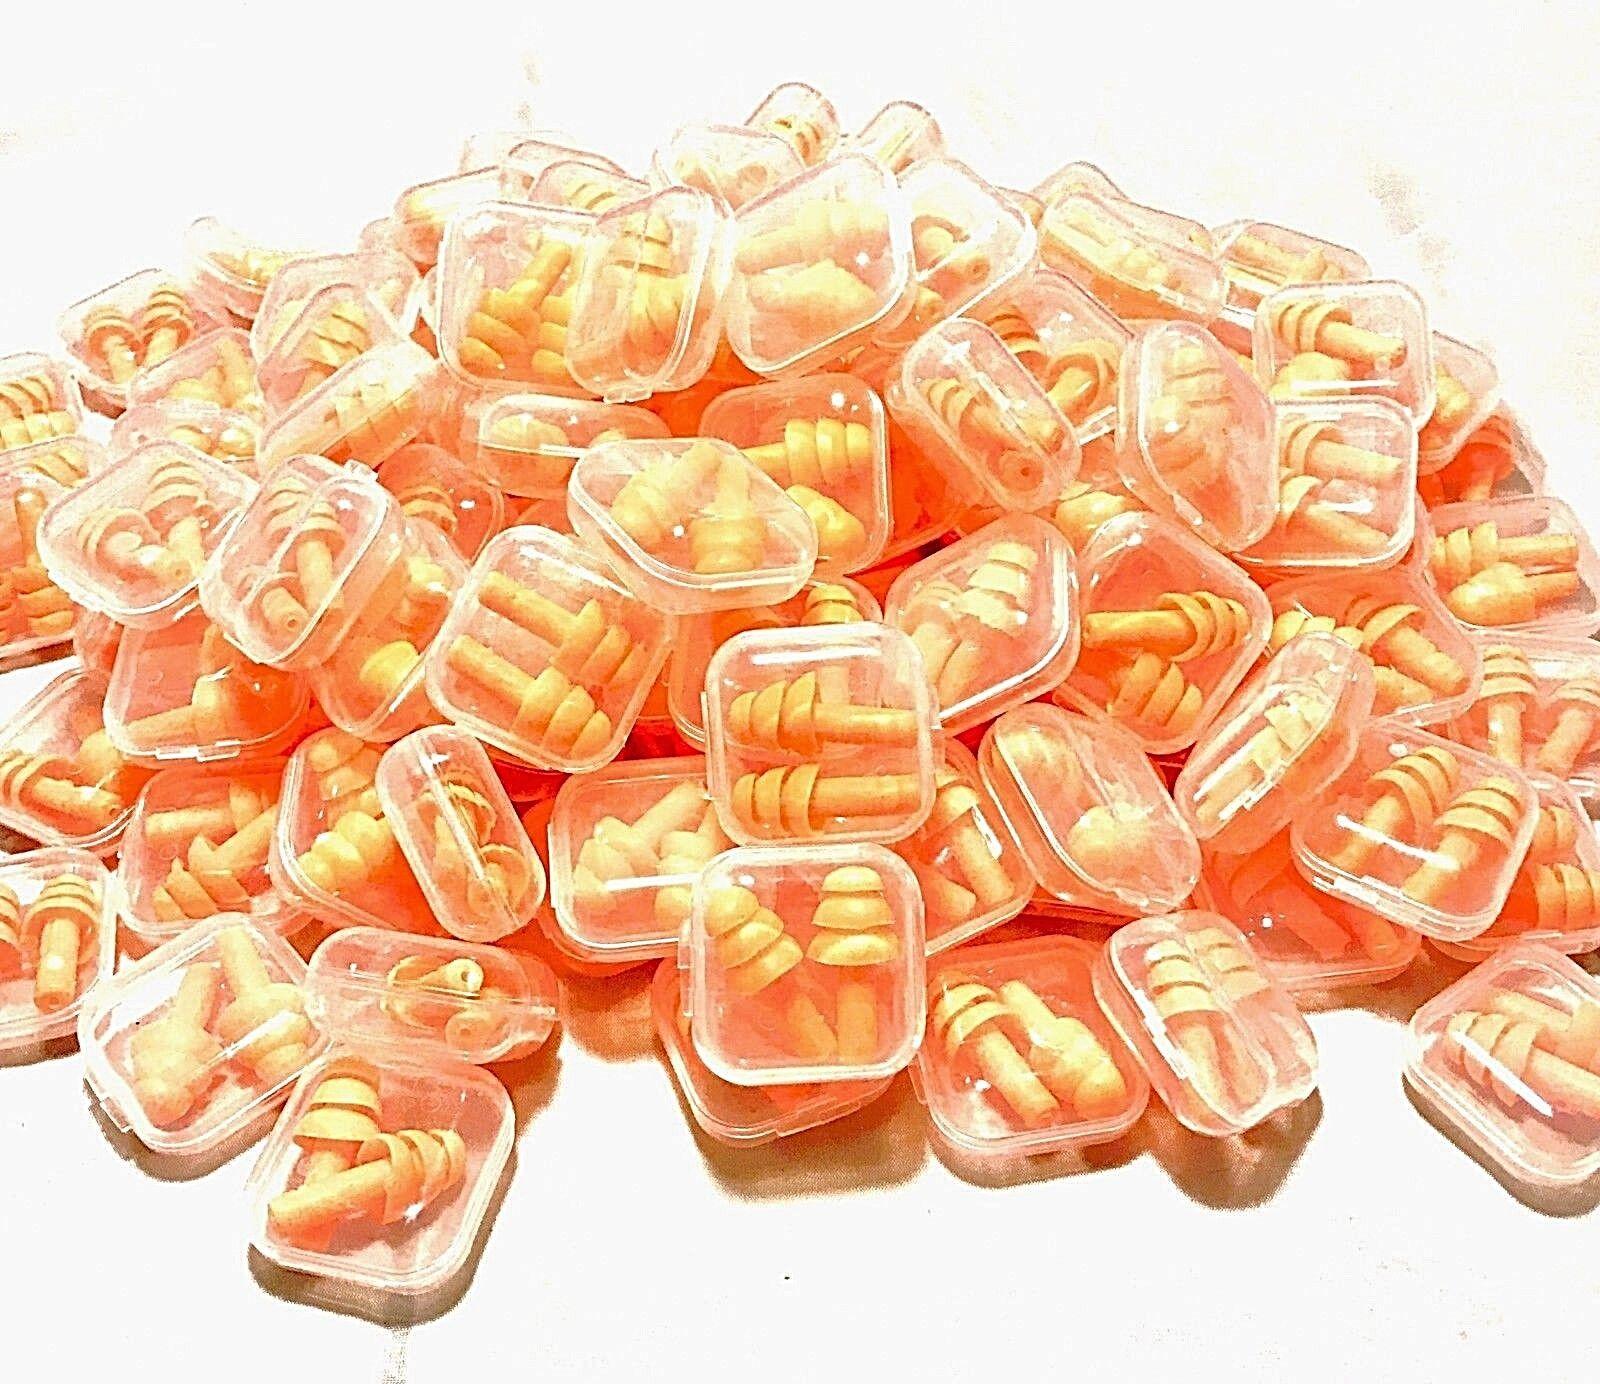 Ear Plugs 10 Pairs Orange Silicone Ear Plugs 33dB Anti Noise